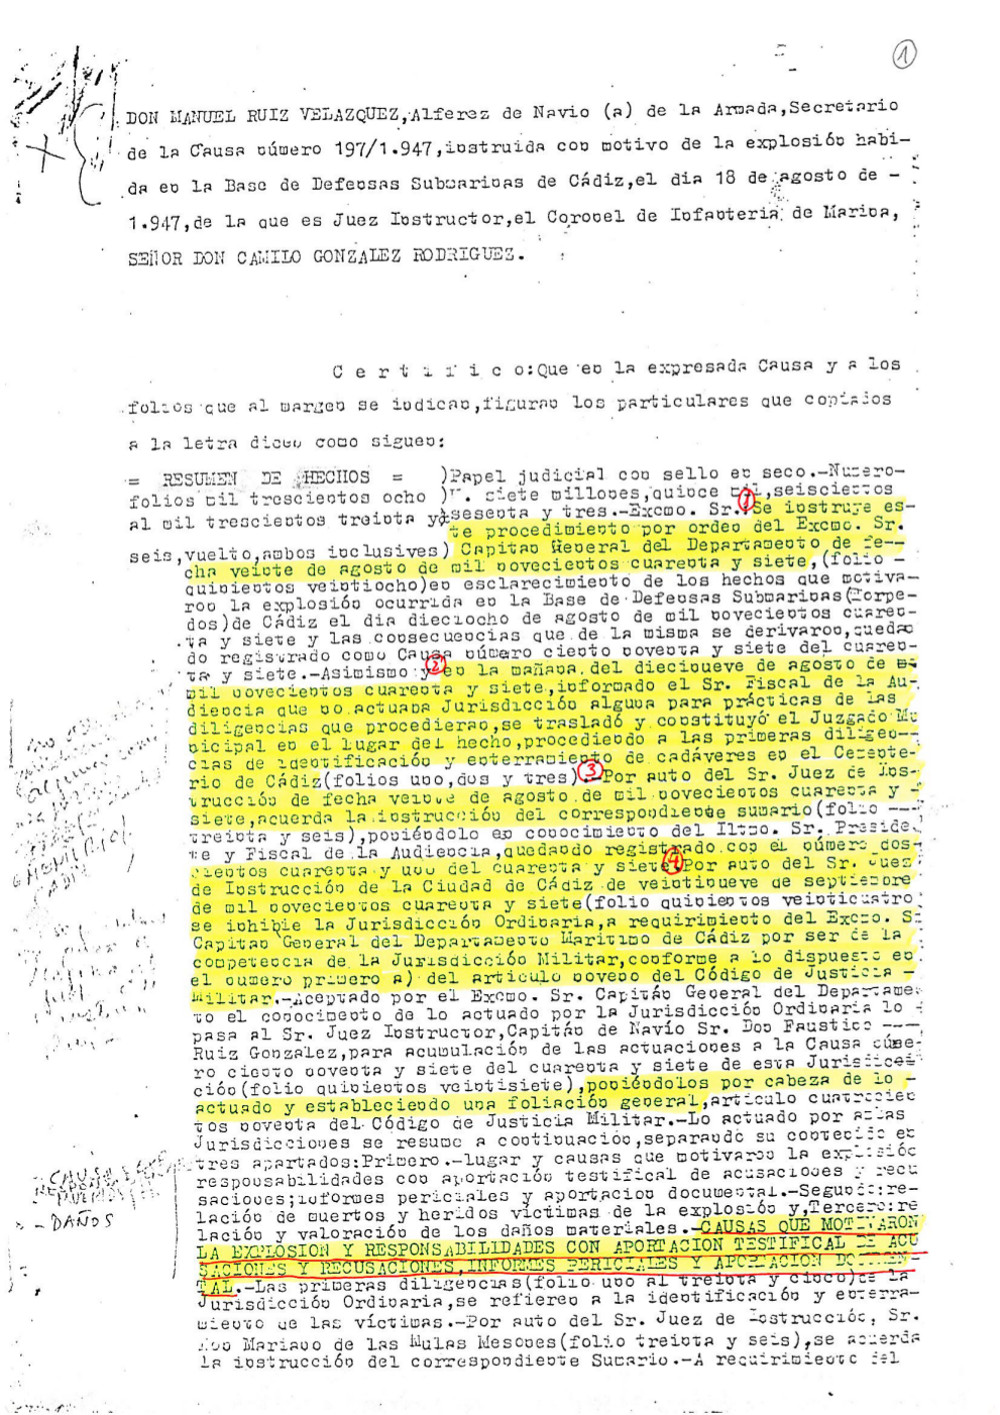 Resumen de la causa militar 197/47